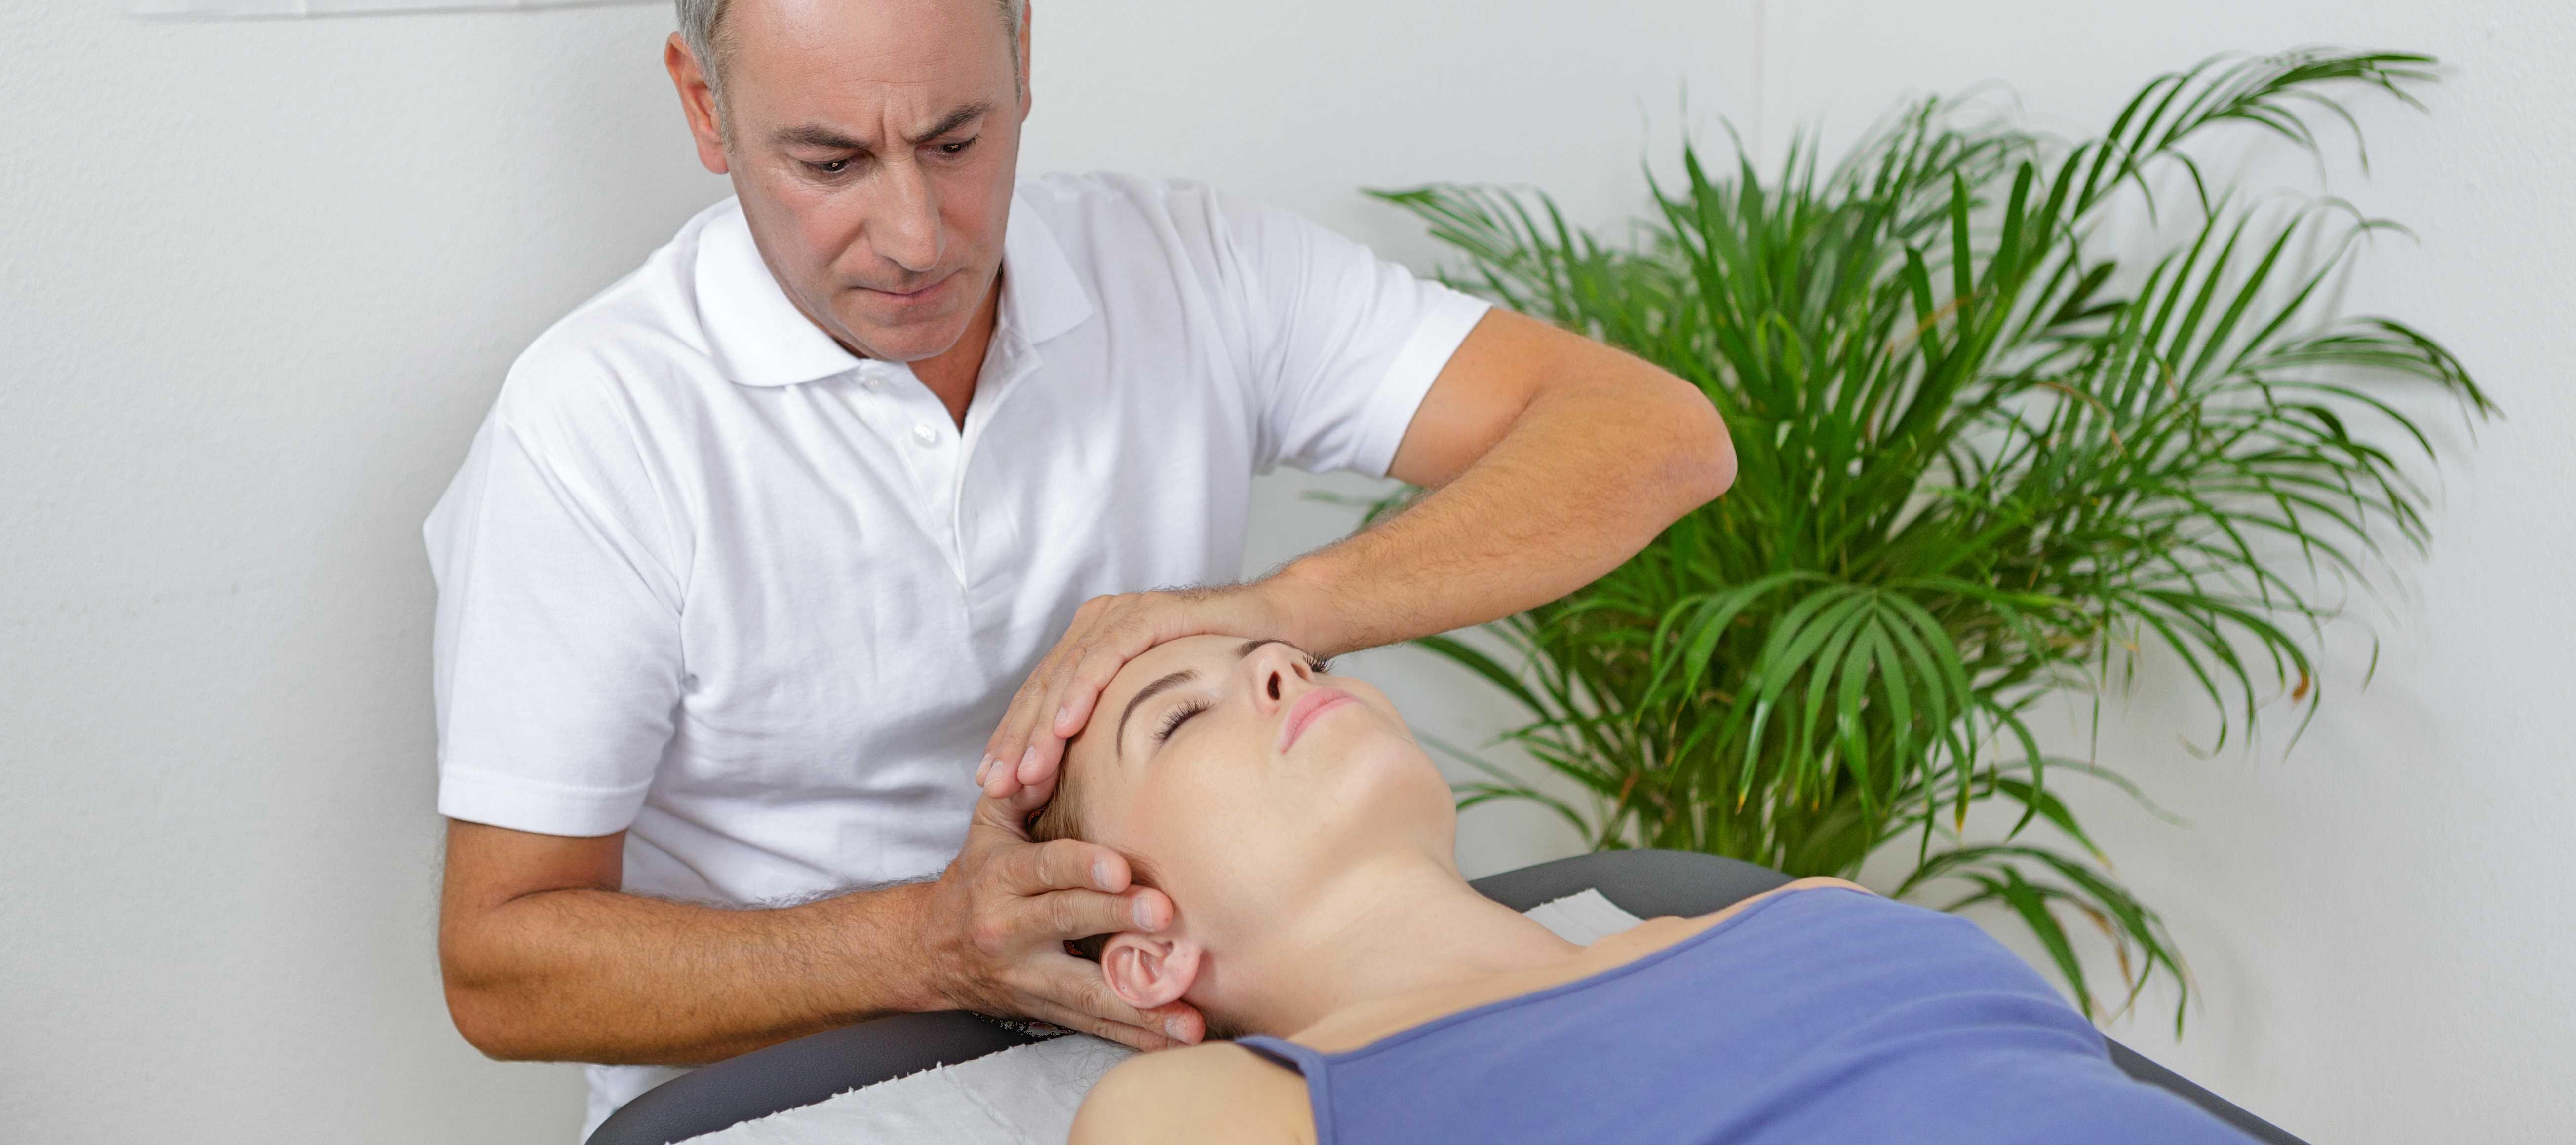 Chiropractic Marketing Strategies - Marketing Consultant in Springfield Missouri